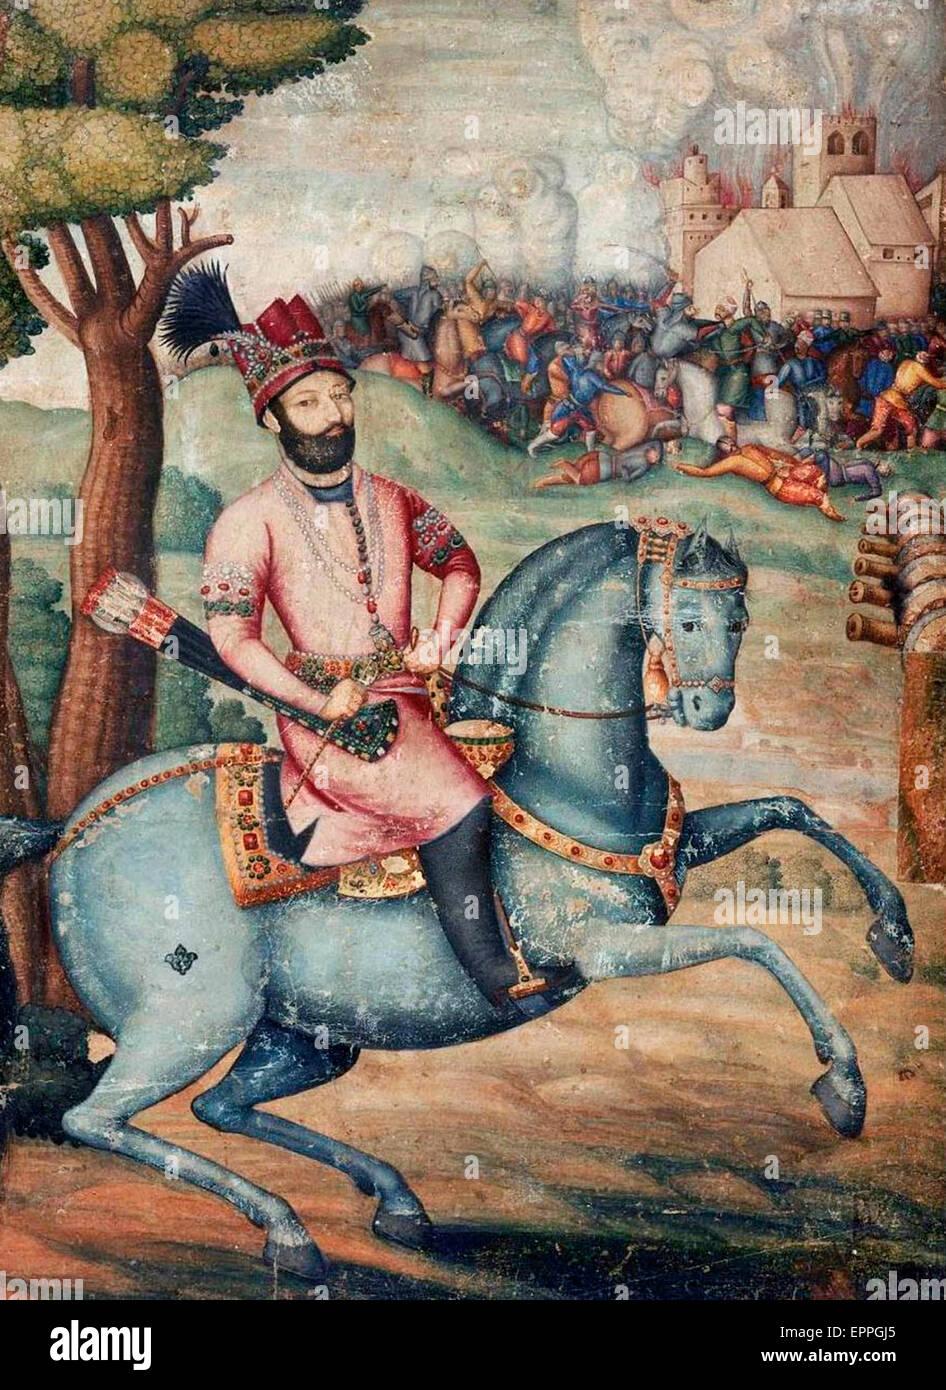 Nadir Shah at the sack of Delhi - Battle scene with Nader Shah on horseback  1739 - Stock Image